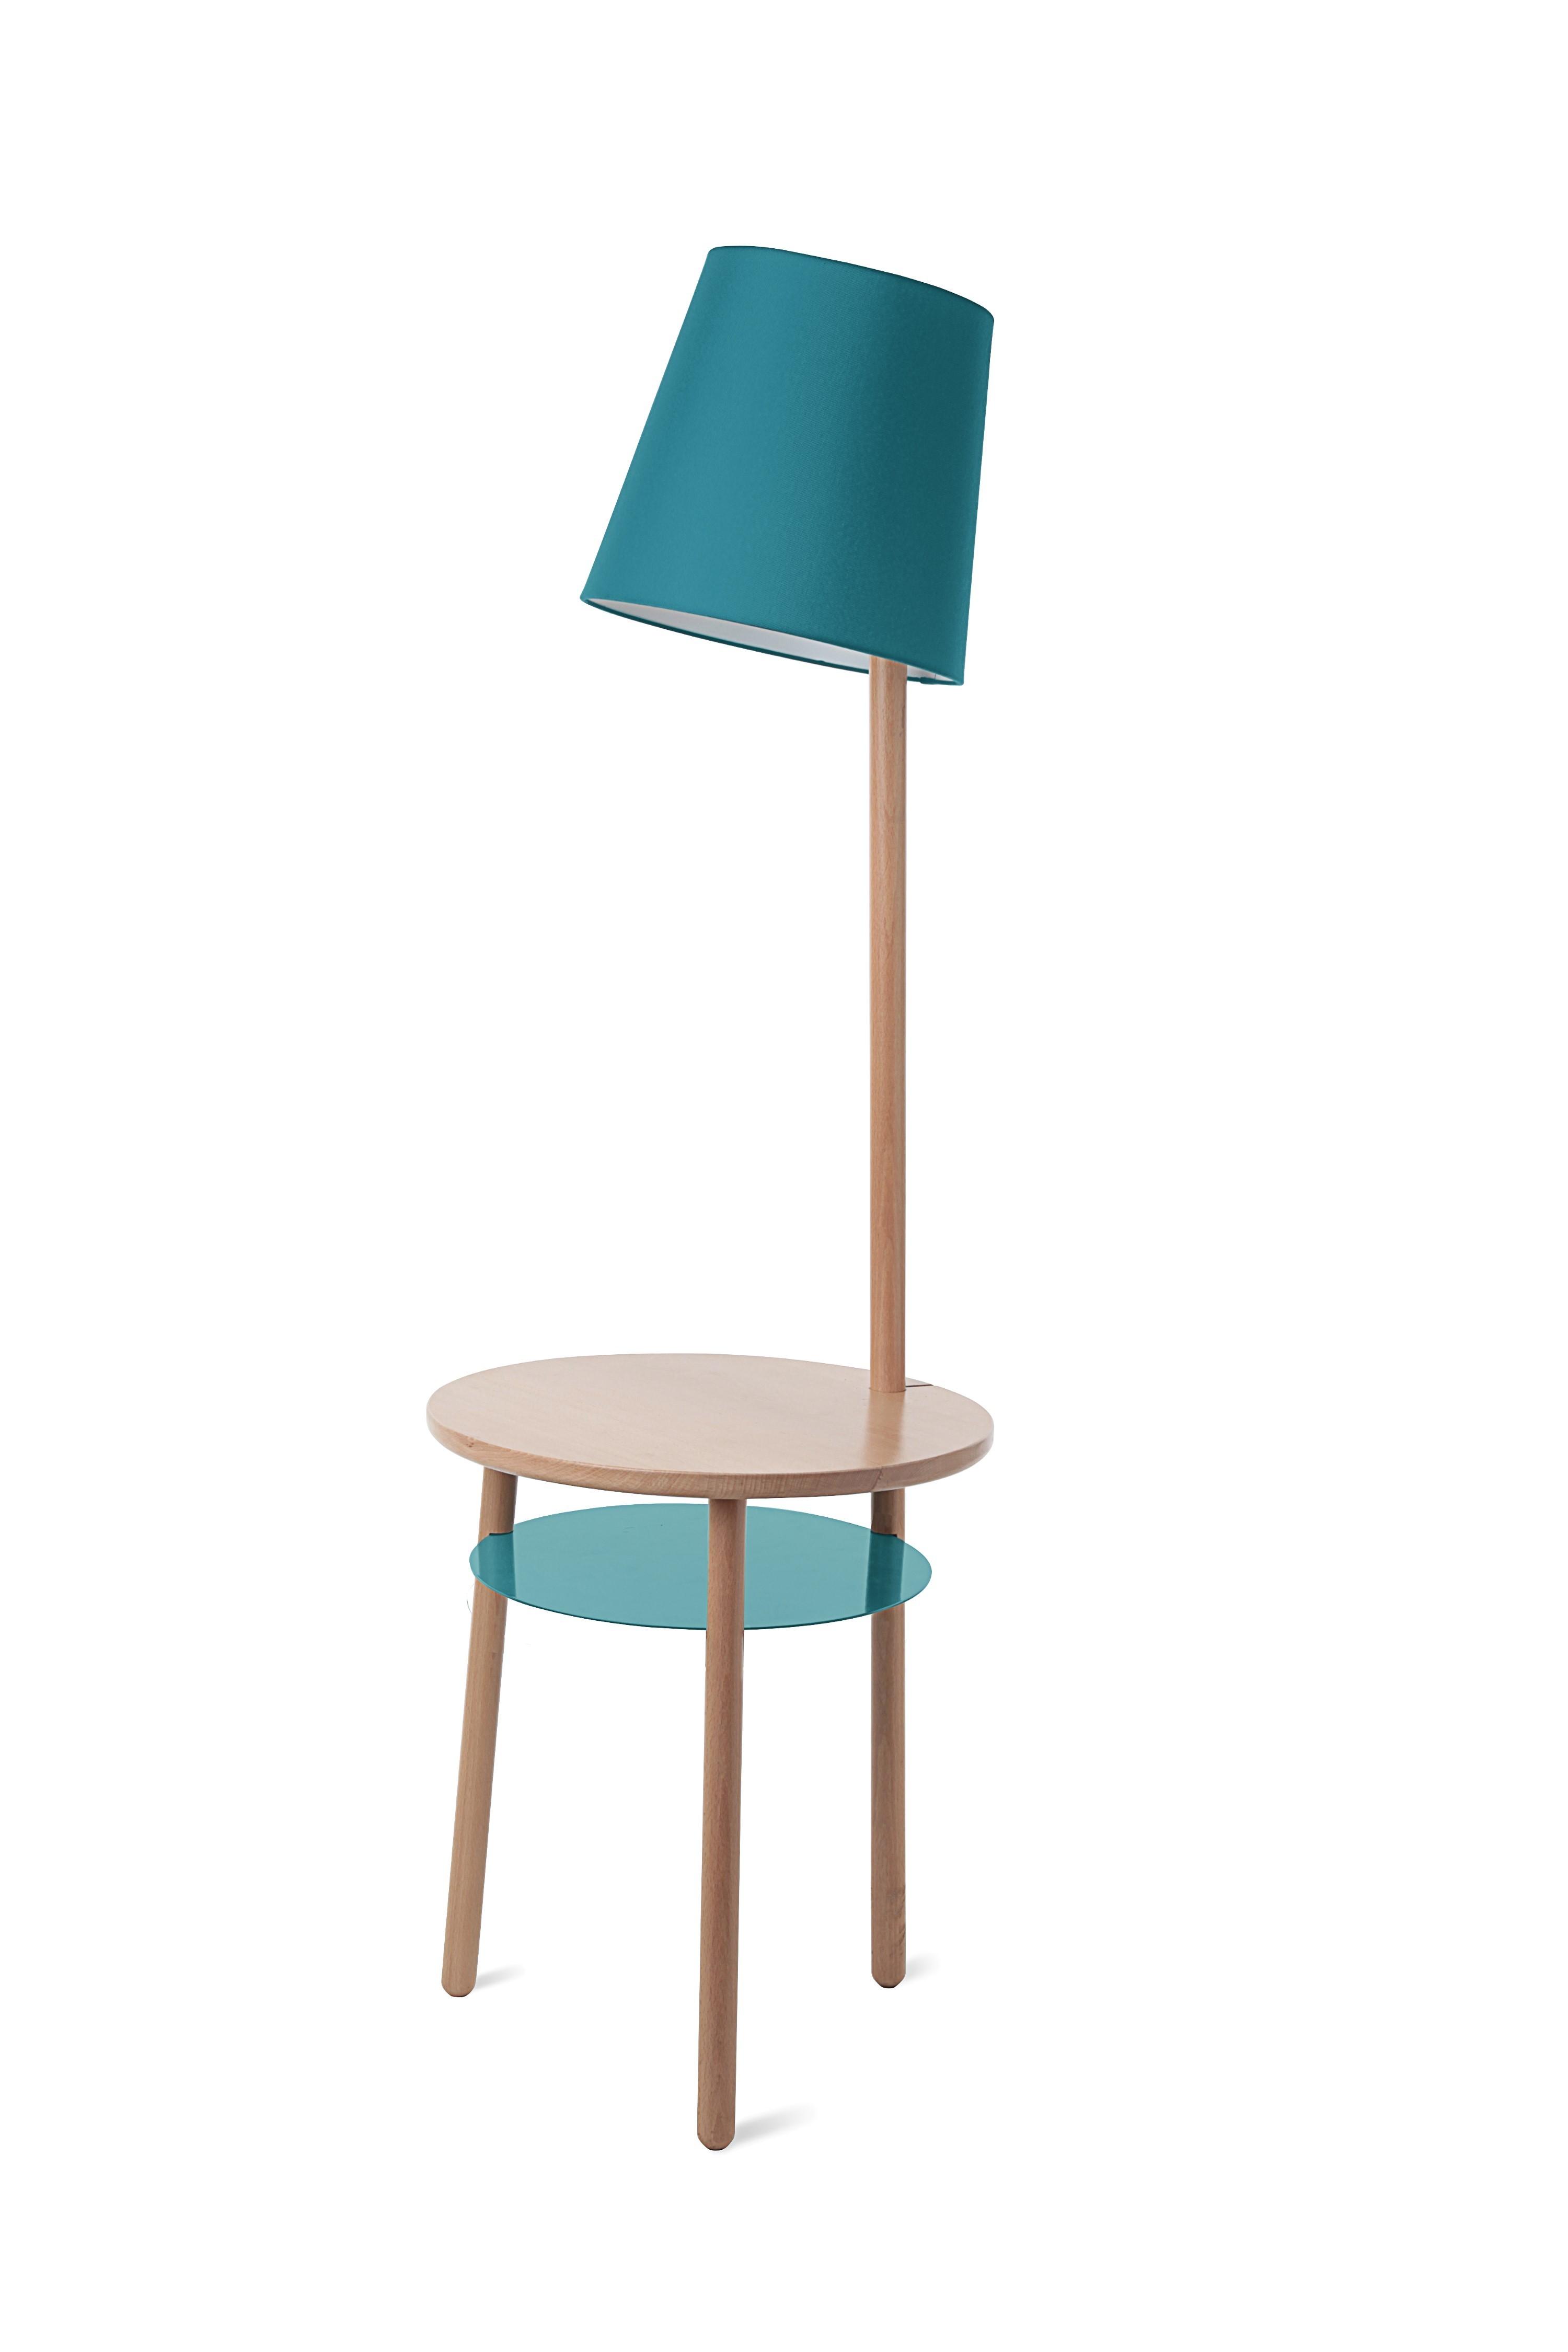 lampe gu ridon avec table naturelle josette de hart 3 coloris. Black Bedroom Furniture Sets. Home Design Ideas